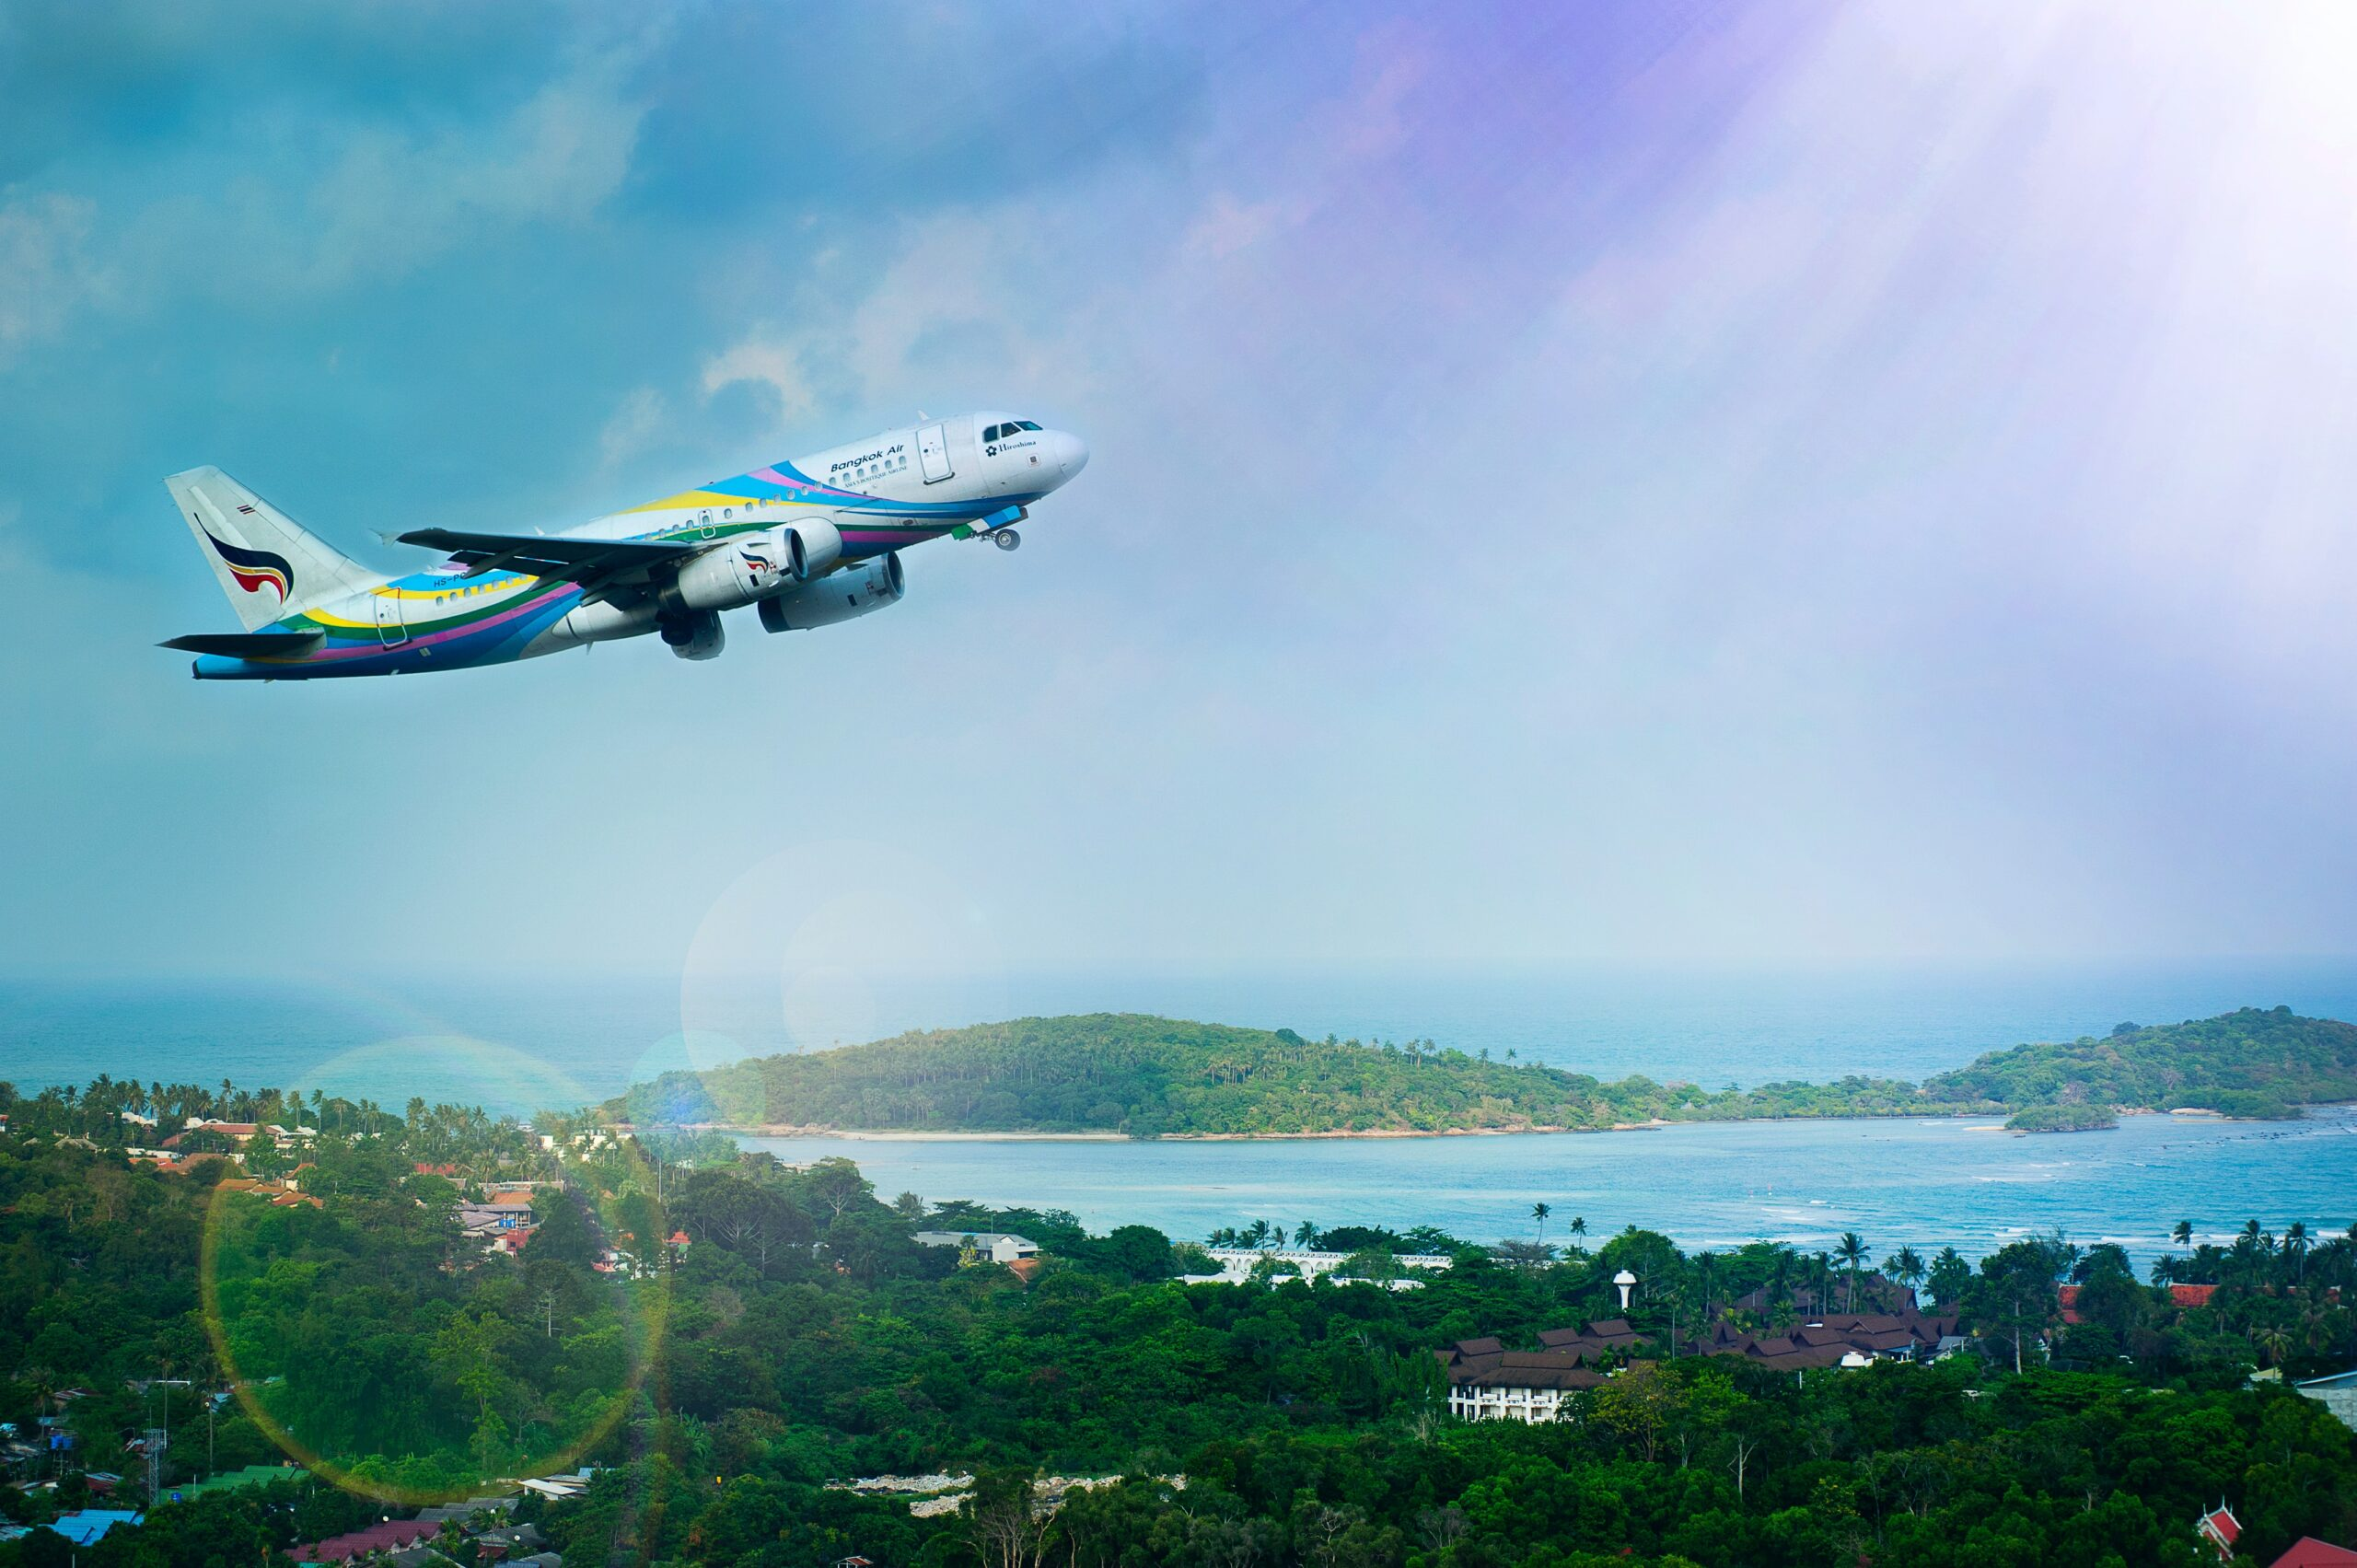 Avion de turismo despegando pexels alexandr podvalny 1004584